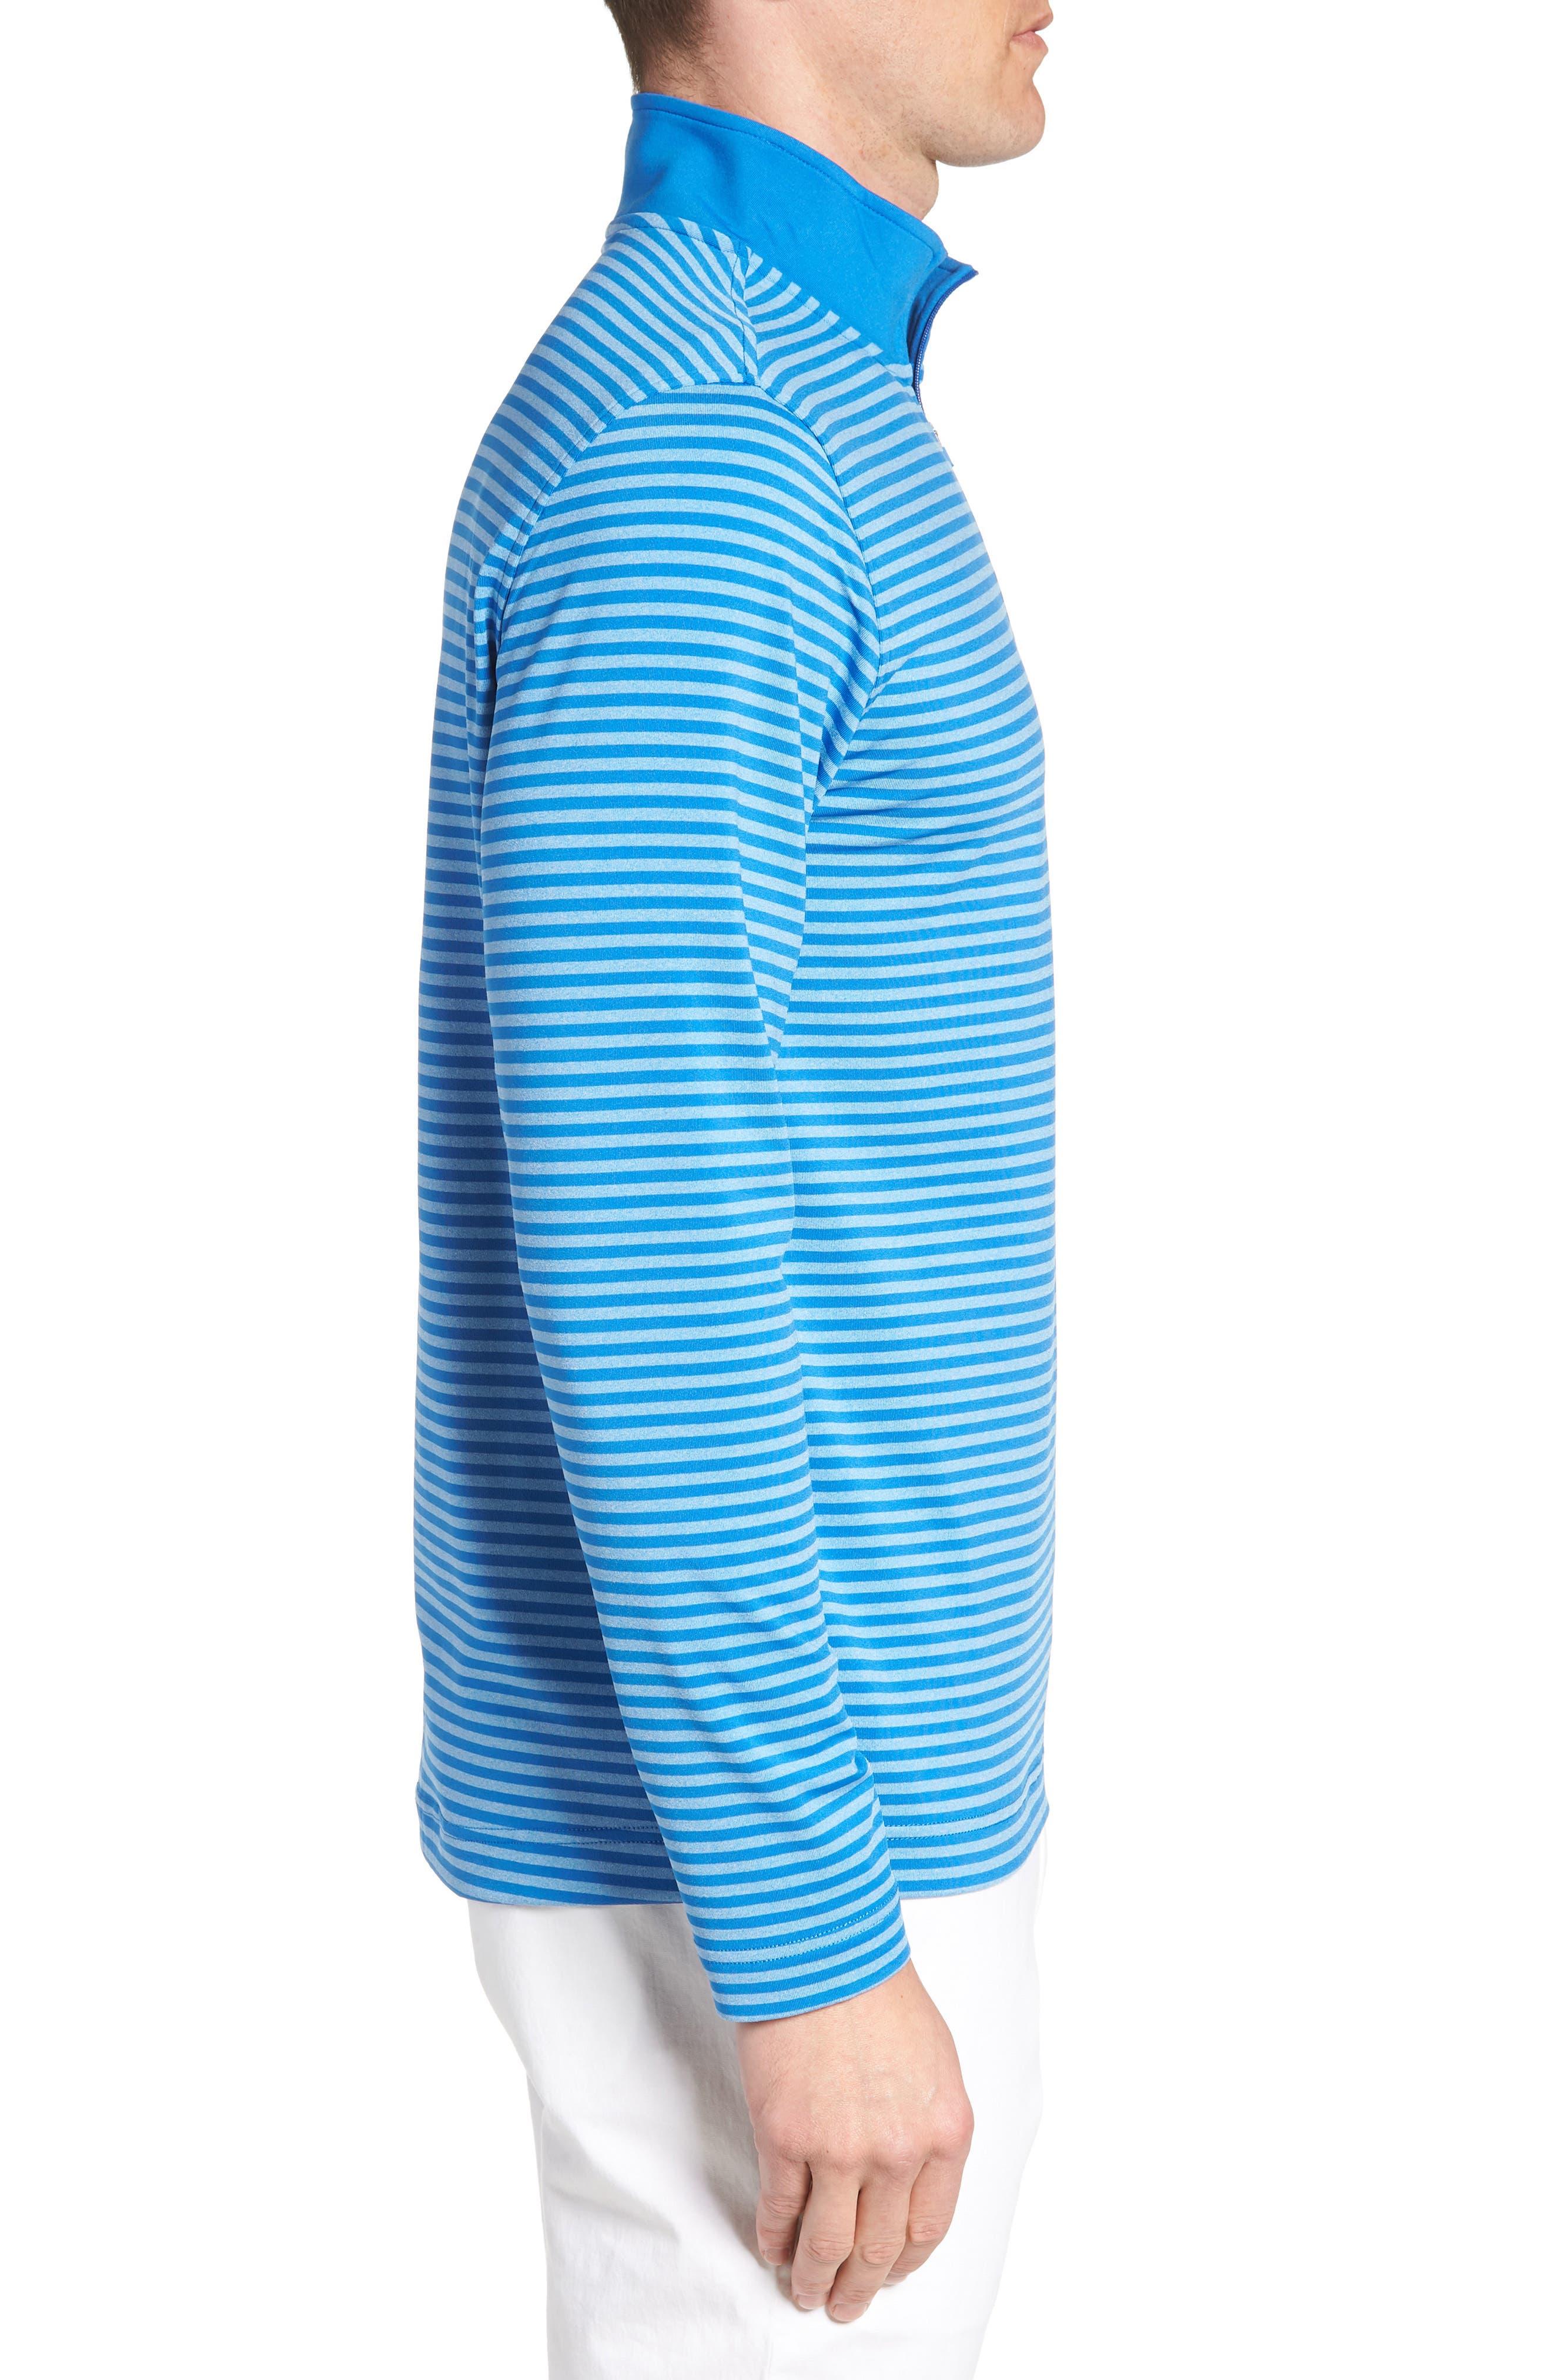 SOUTHERN TIDE,                             Stripe Quarter Zip Pullover,                             Alternate thumbnail 3, color,                             400